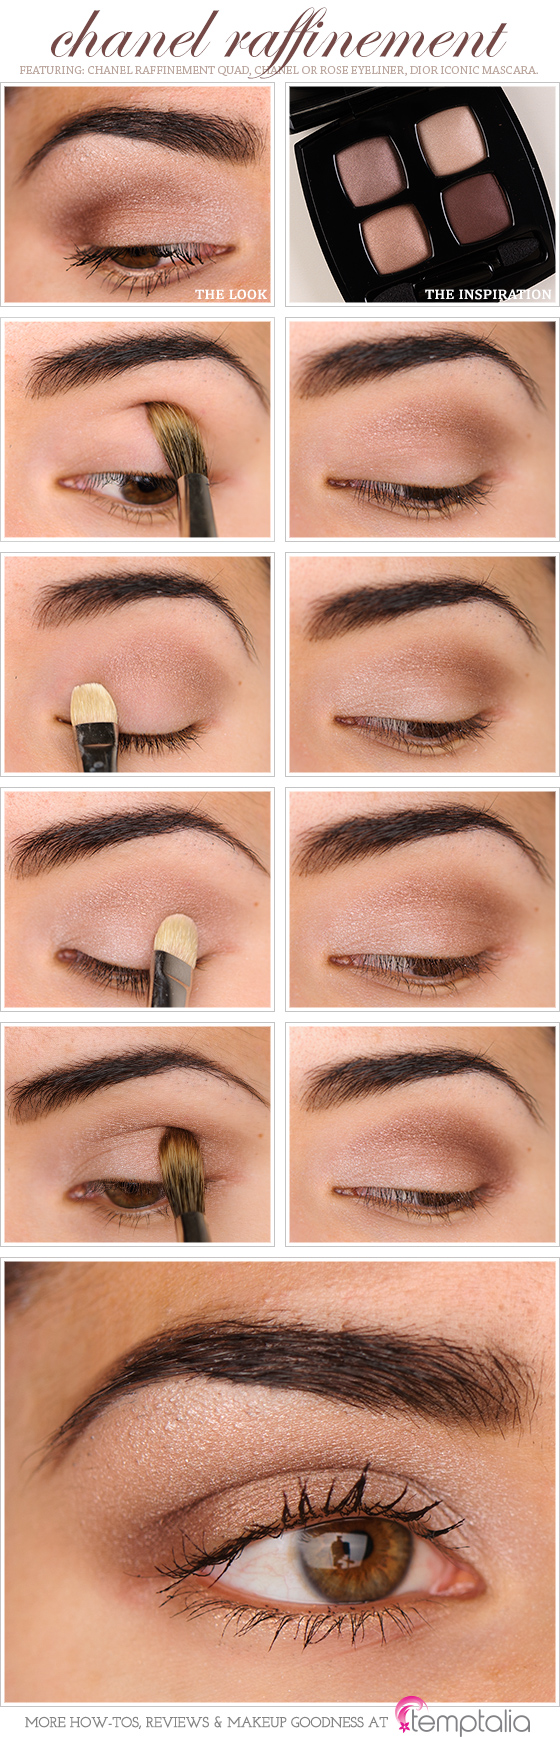 Chanel Raffinement Eyeshadow Quad